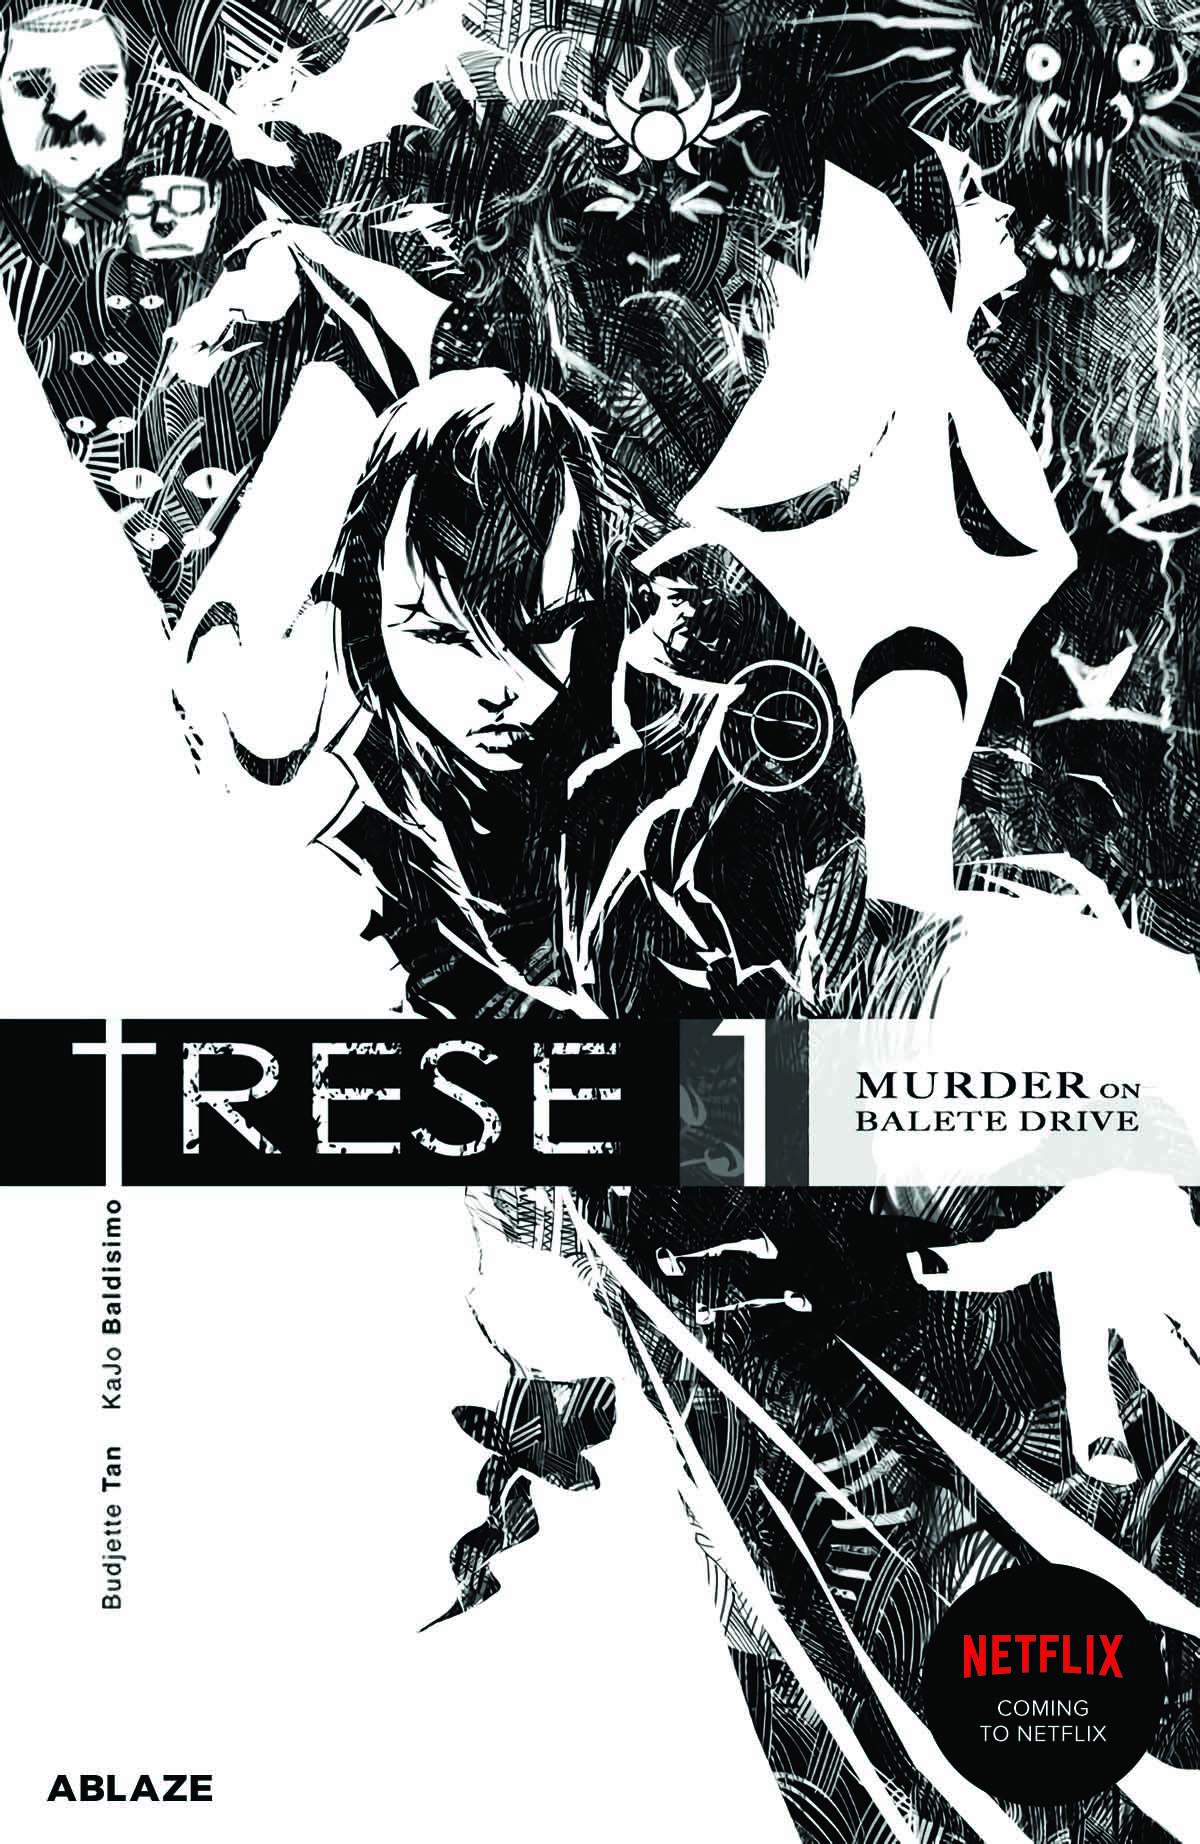 TRESE-VOL-1-V3-cover.jpg